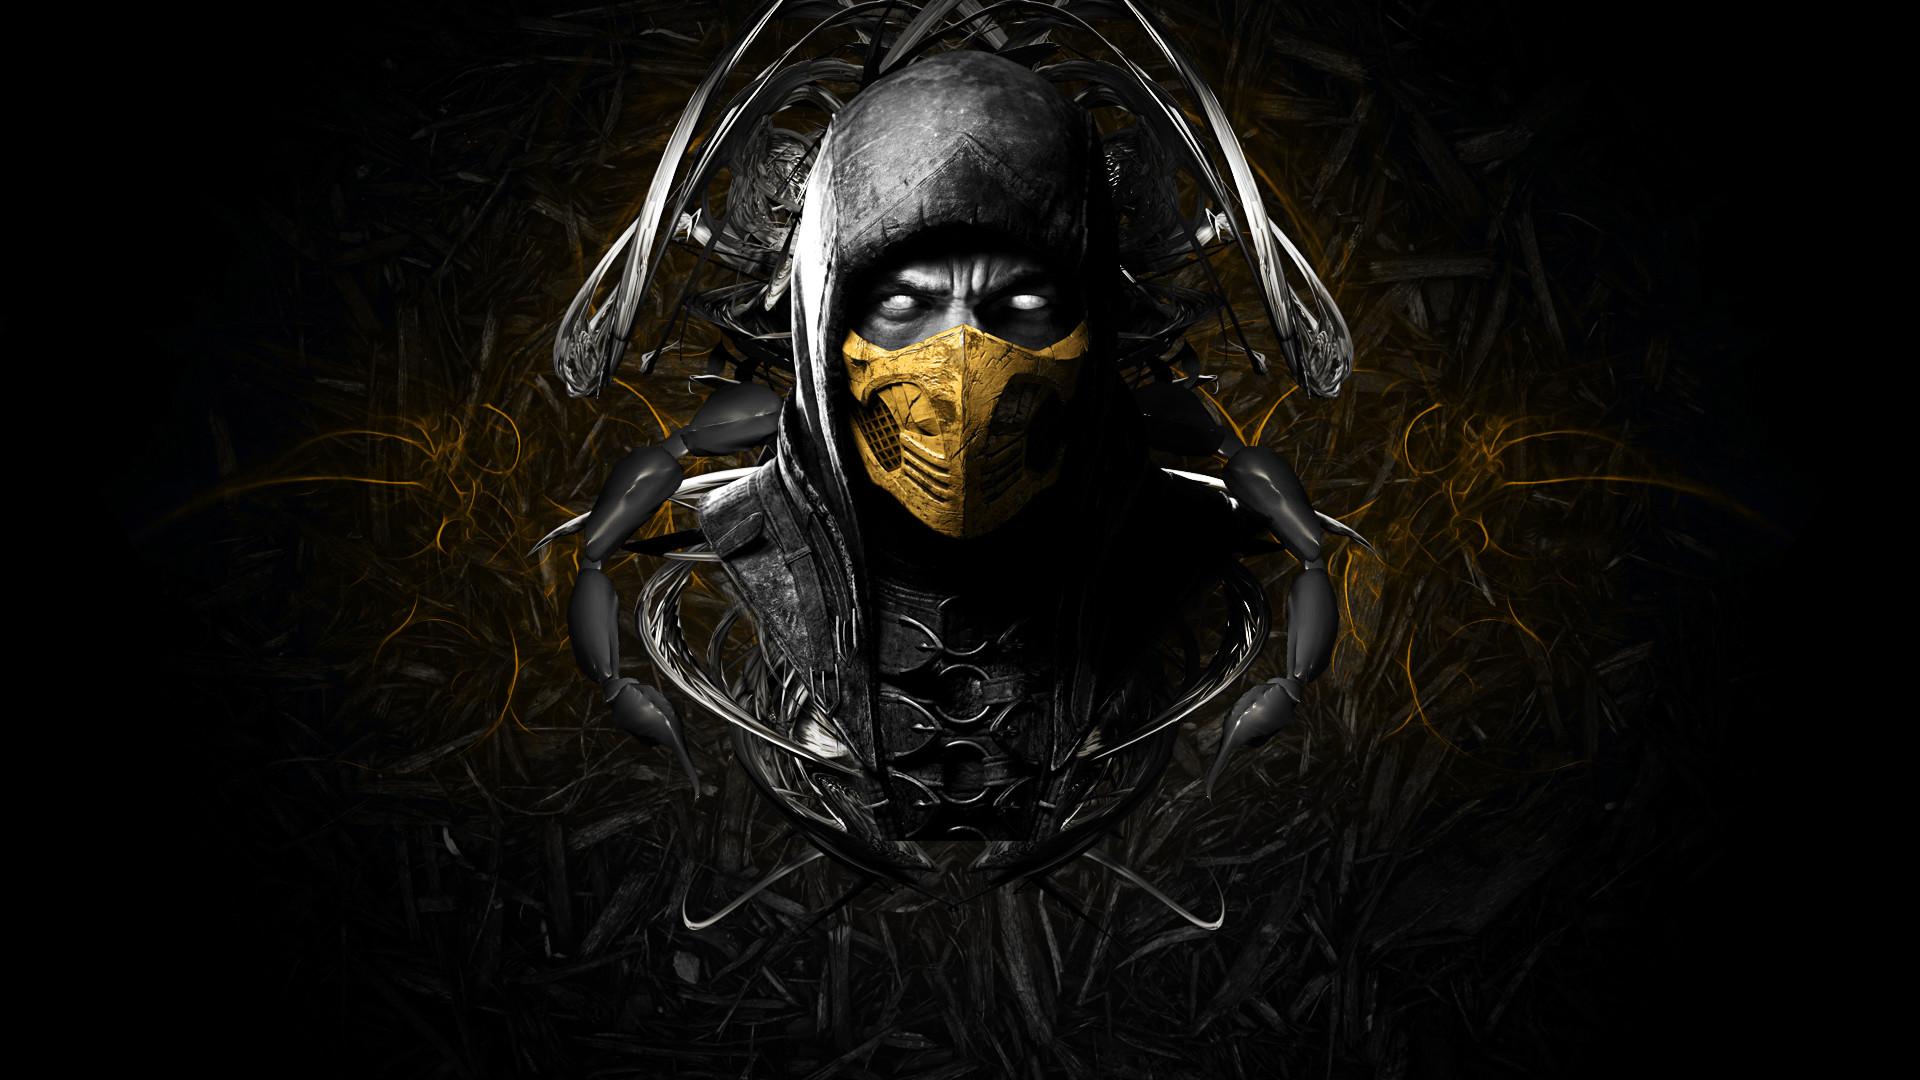 Wallpaper Mortal kombat x, Scorpion, Face, Ninja, Mask